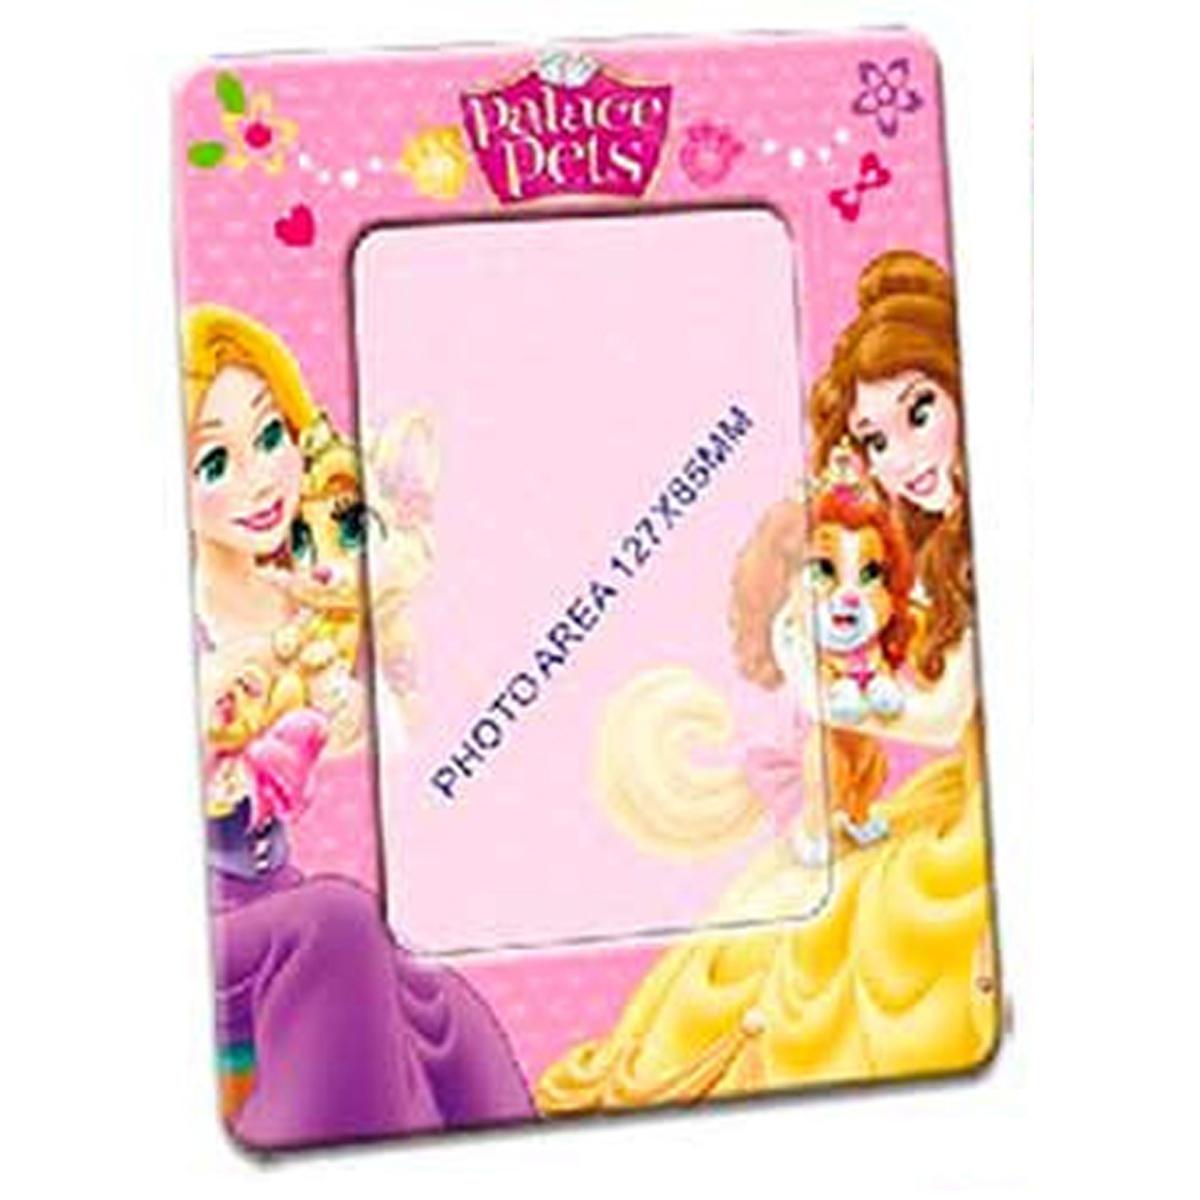 Cadre Photo métal \'Princesses Disney\' rose - 19x15 cm, photo 13x9 cm - [R3062]